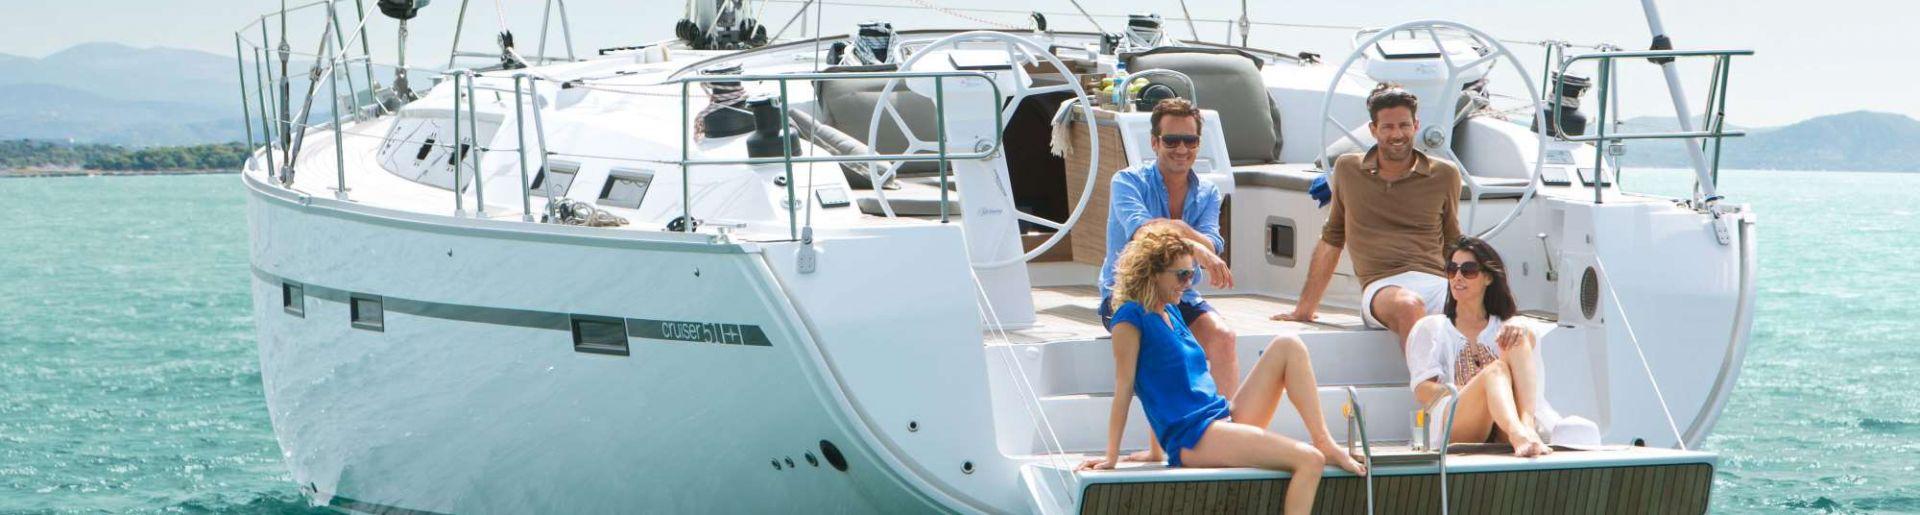 "Bavaria Cruiser 51 ""Summer Smile"""